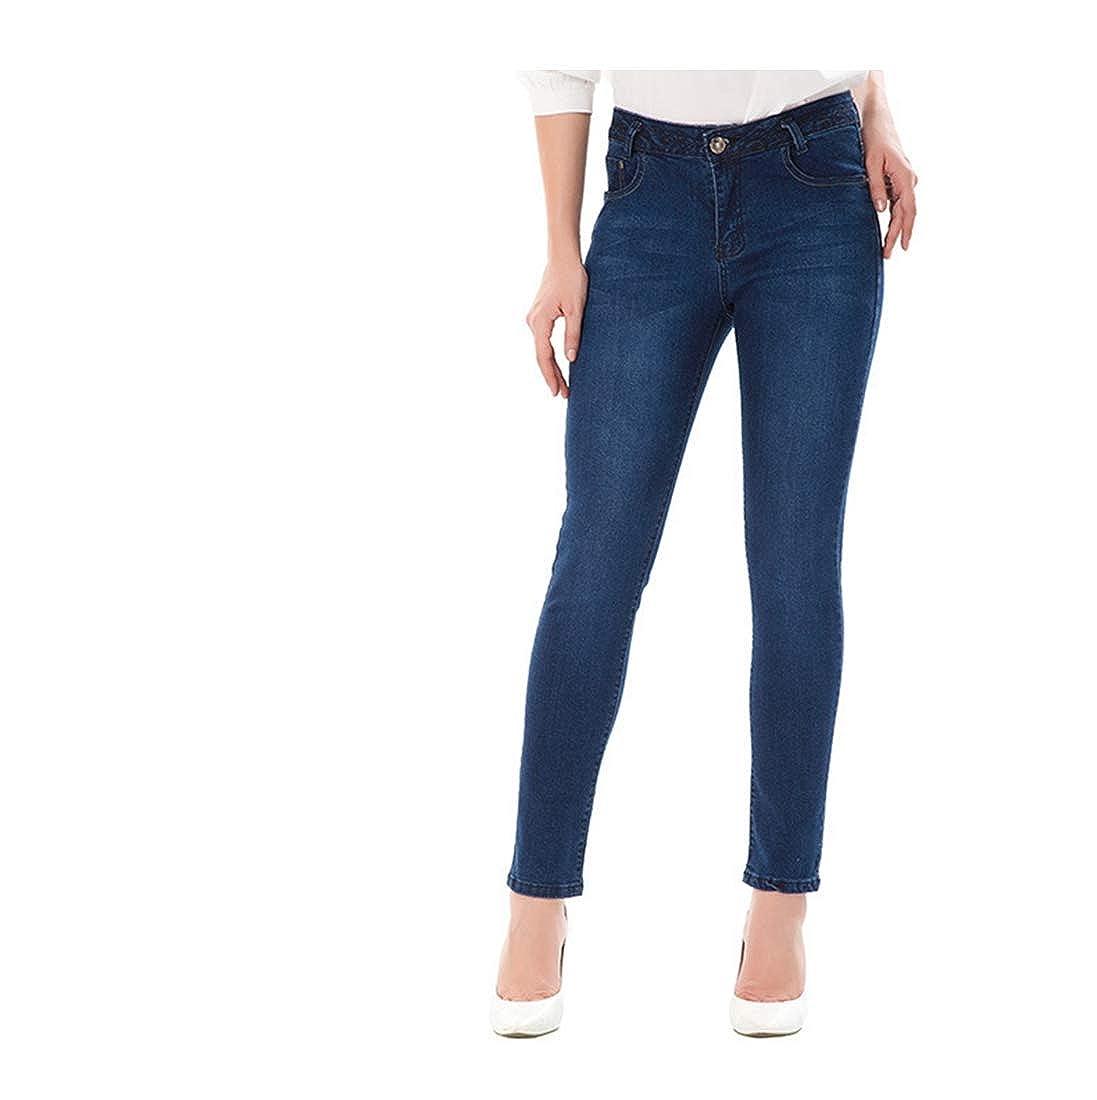 Kirabon Large high-Waist Jeans Womens wear and Winter Trousers